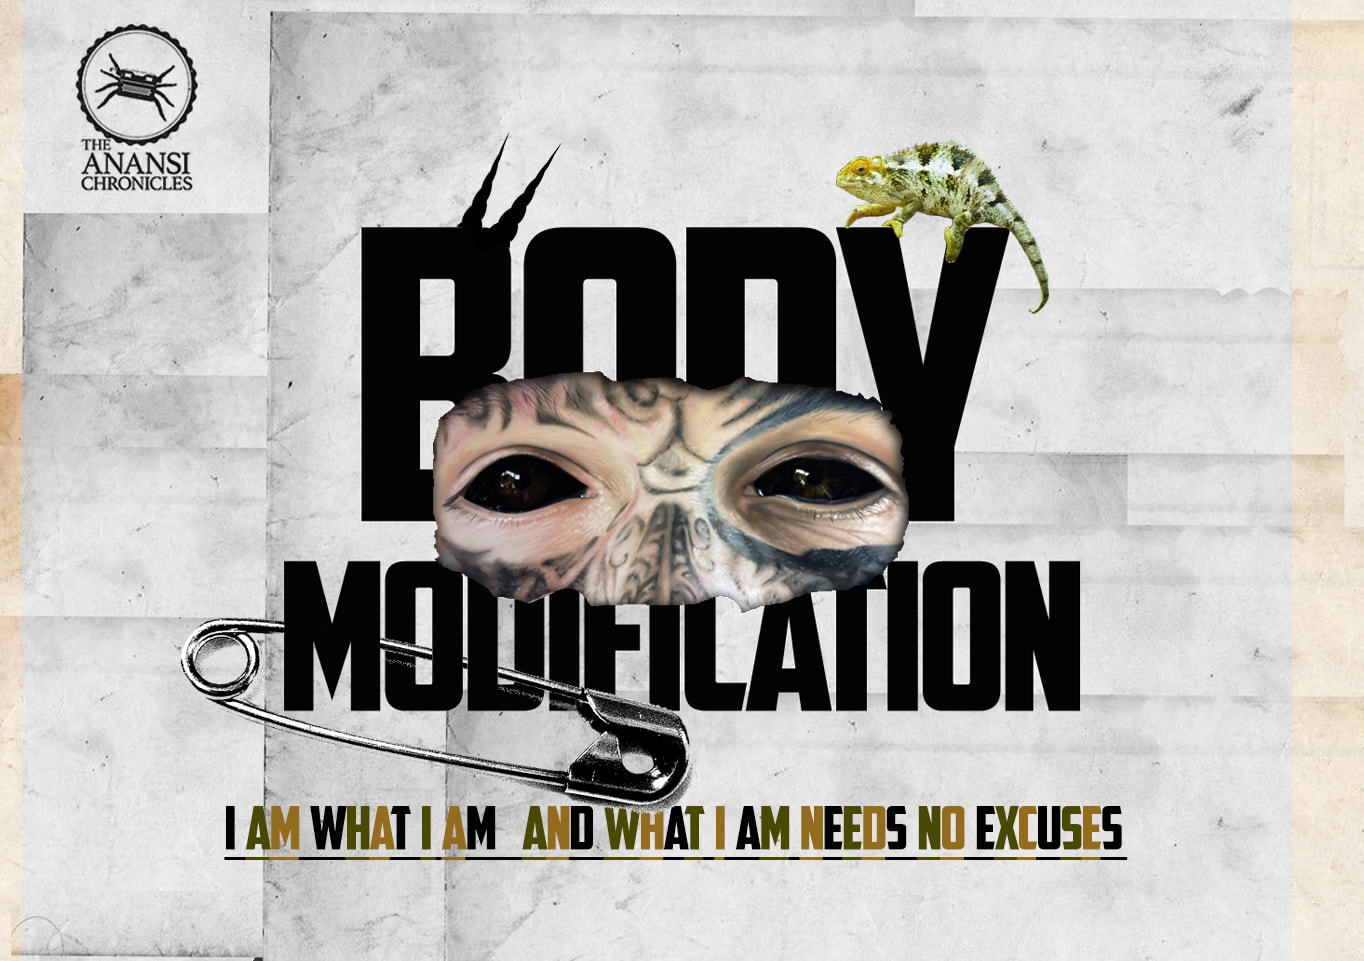 Body-Modification – I Am What I Am